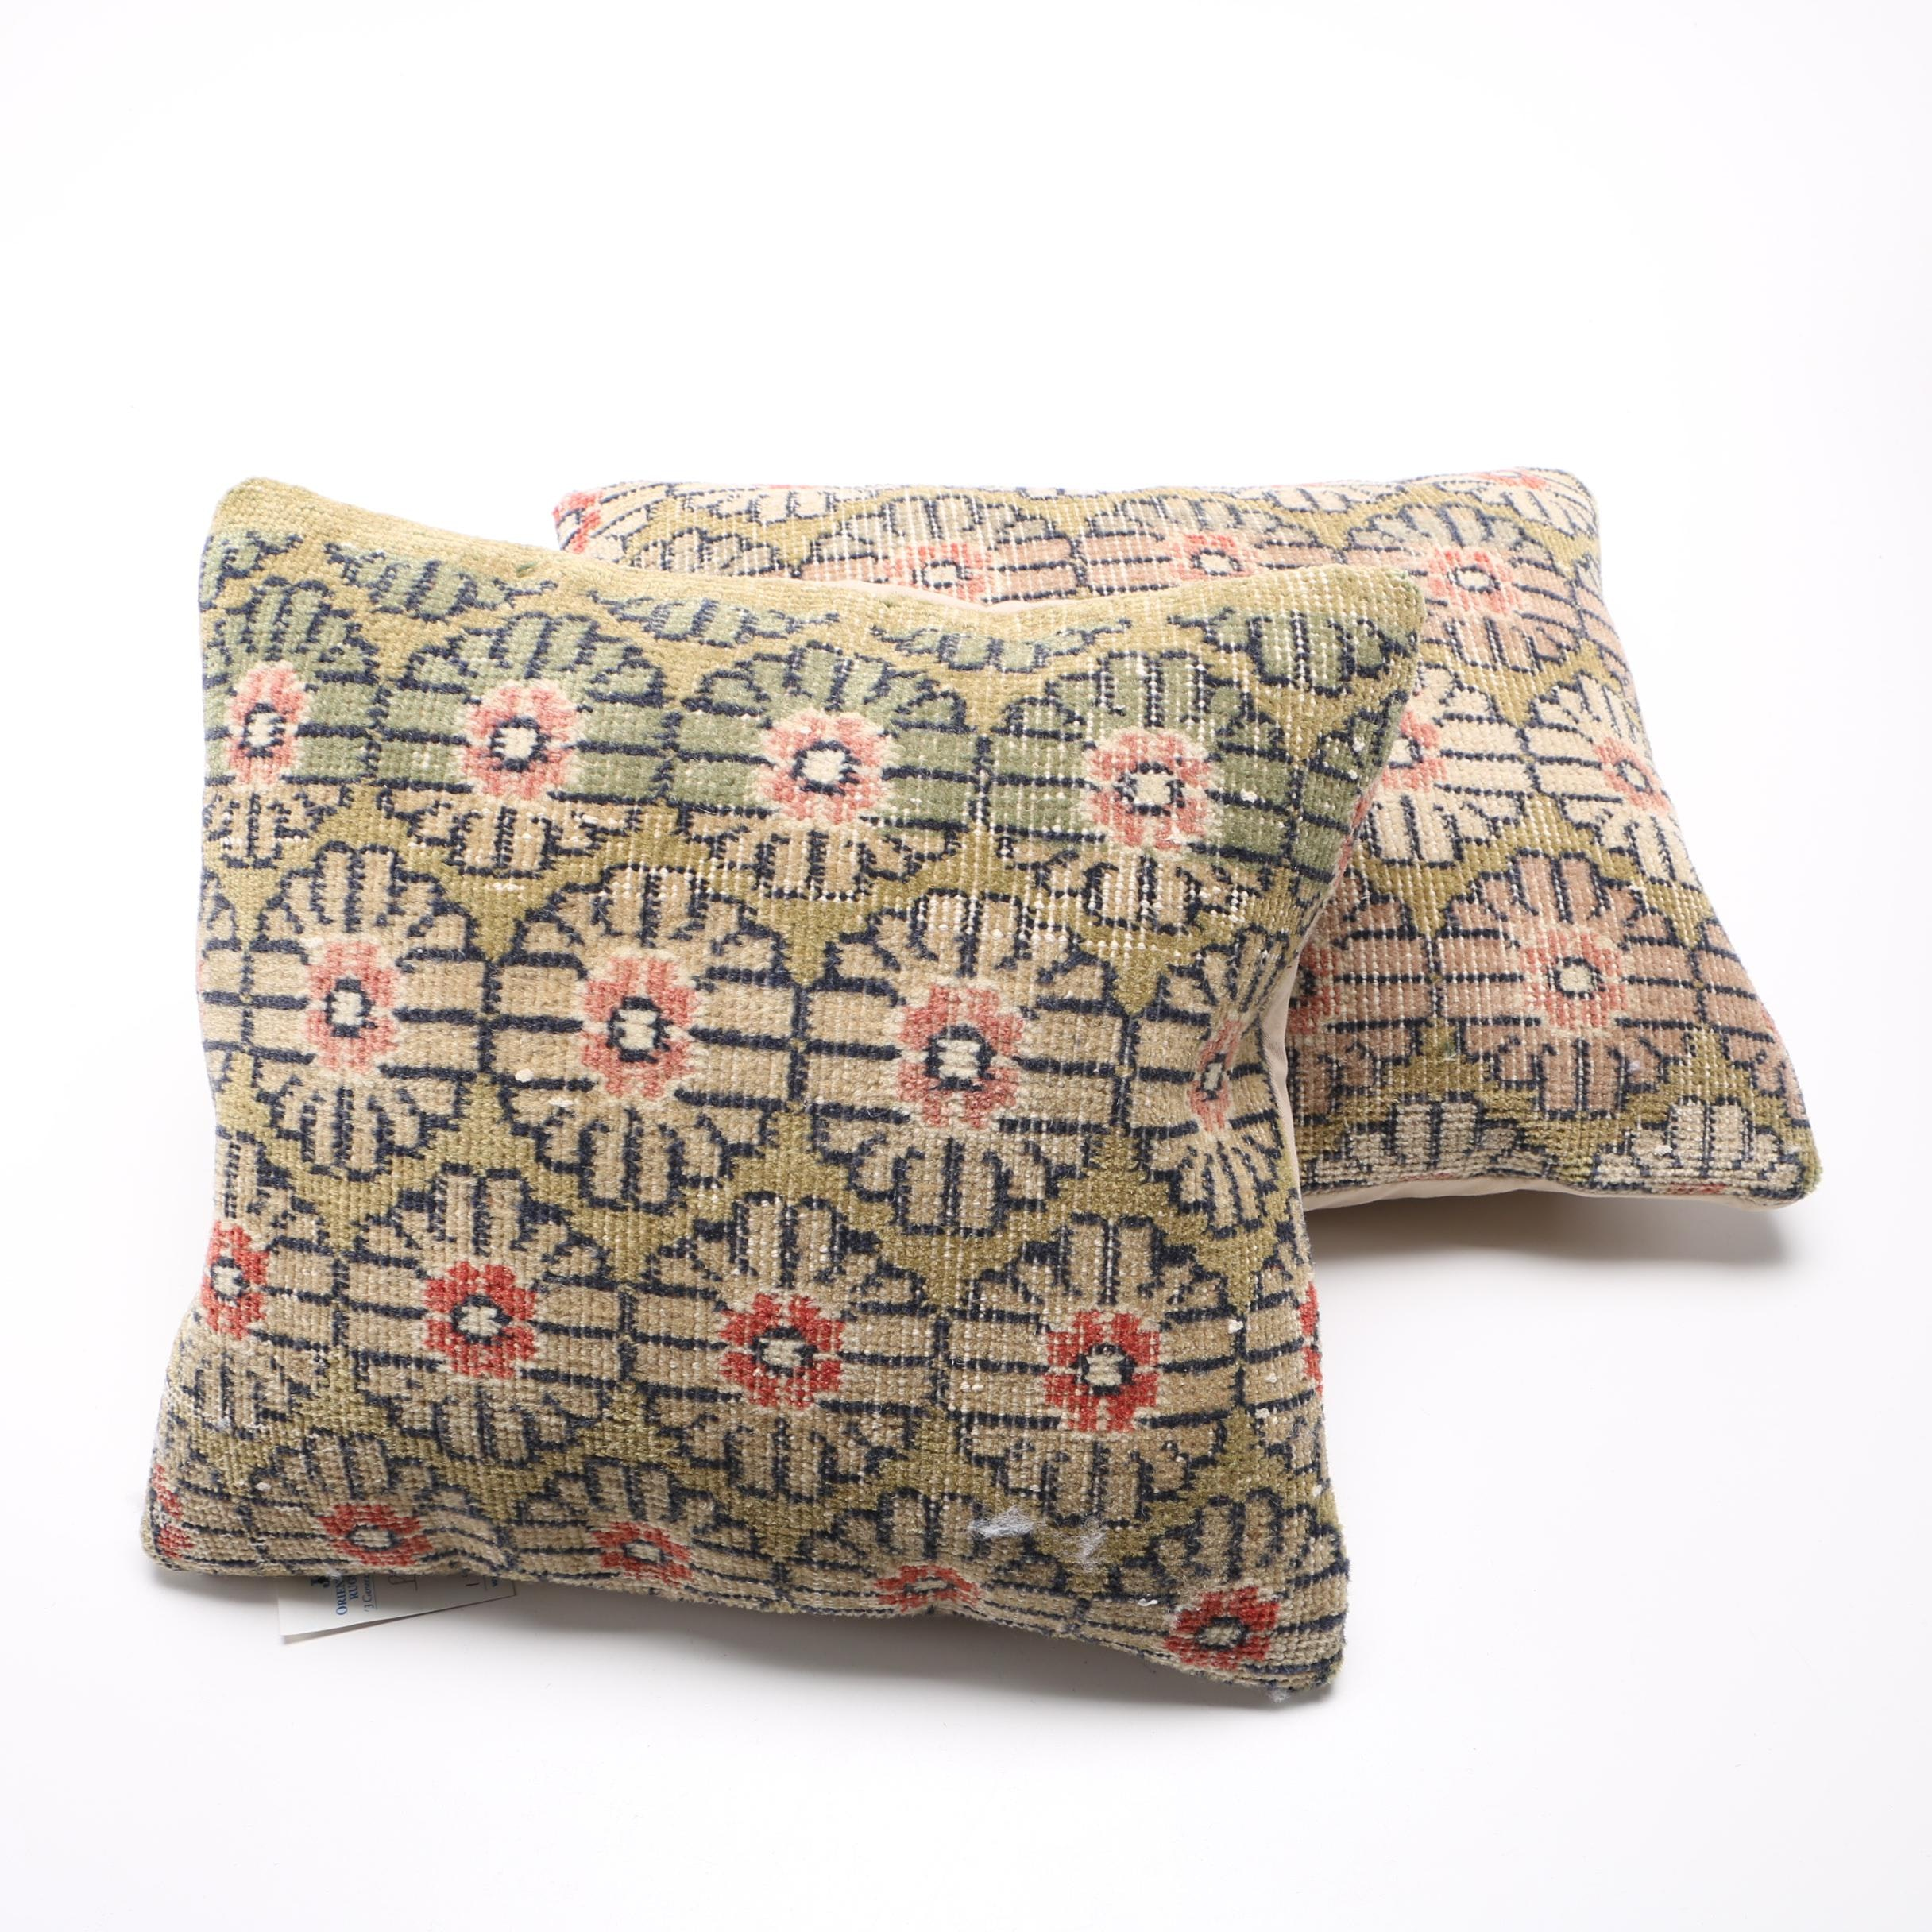 Turkish Handwoven Rug Pillows